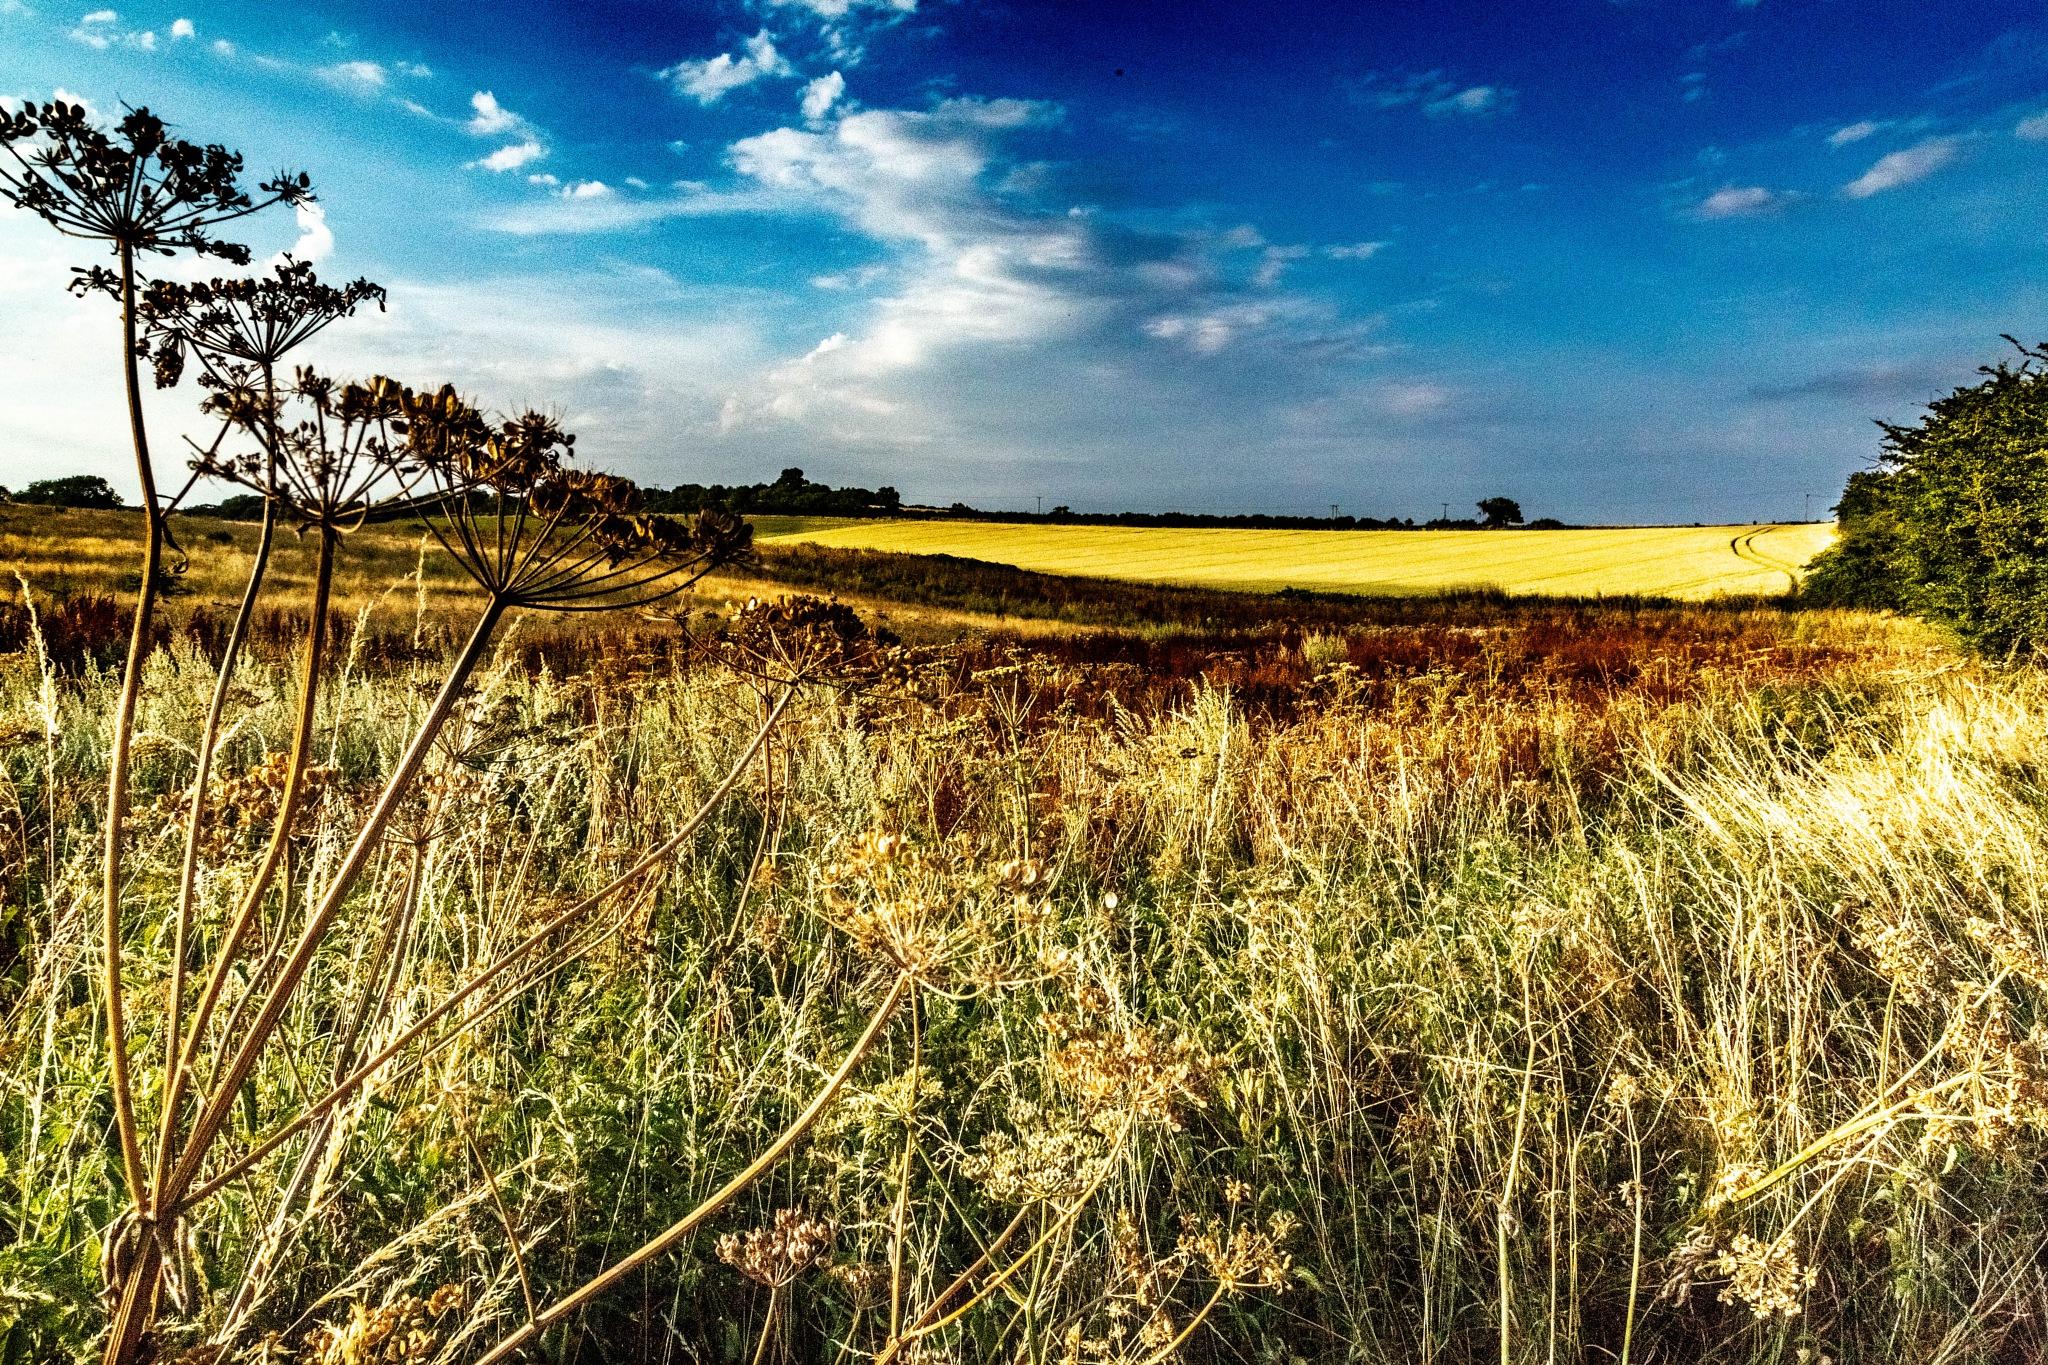 Dry Season by photogaphotography